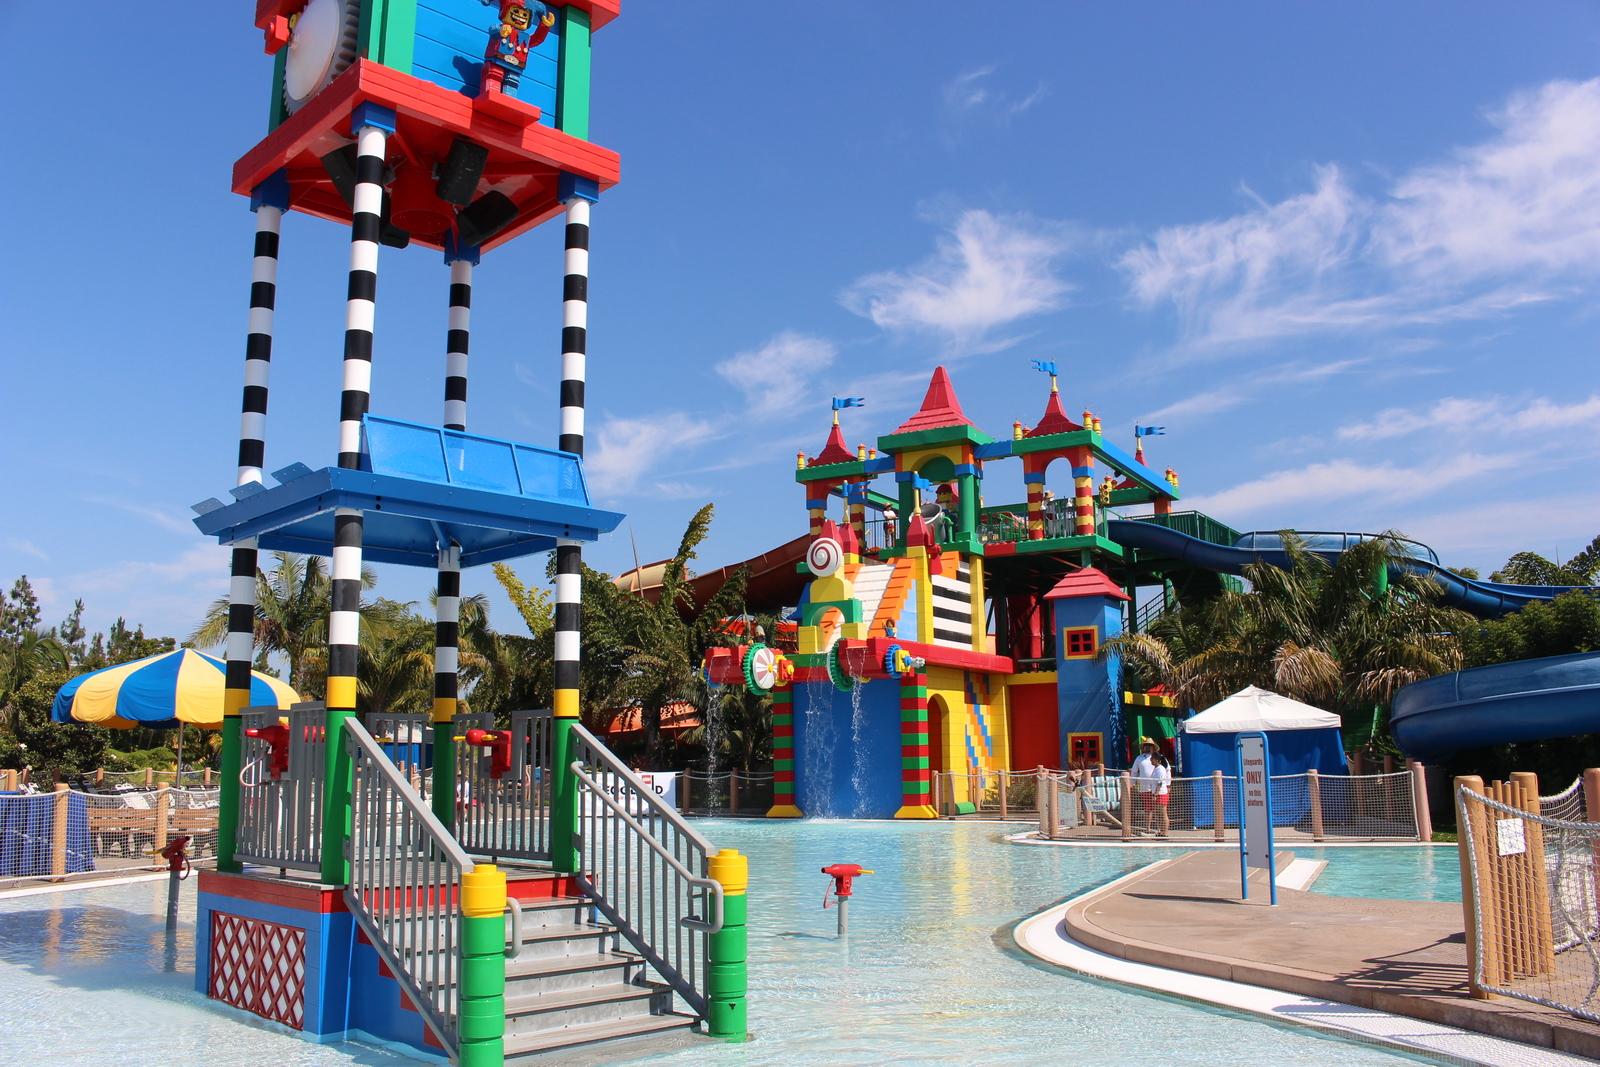 Legoland Water Park In Carlsbad California Kid Friendly